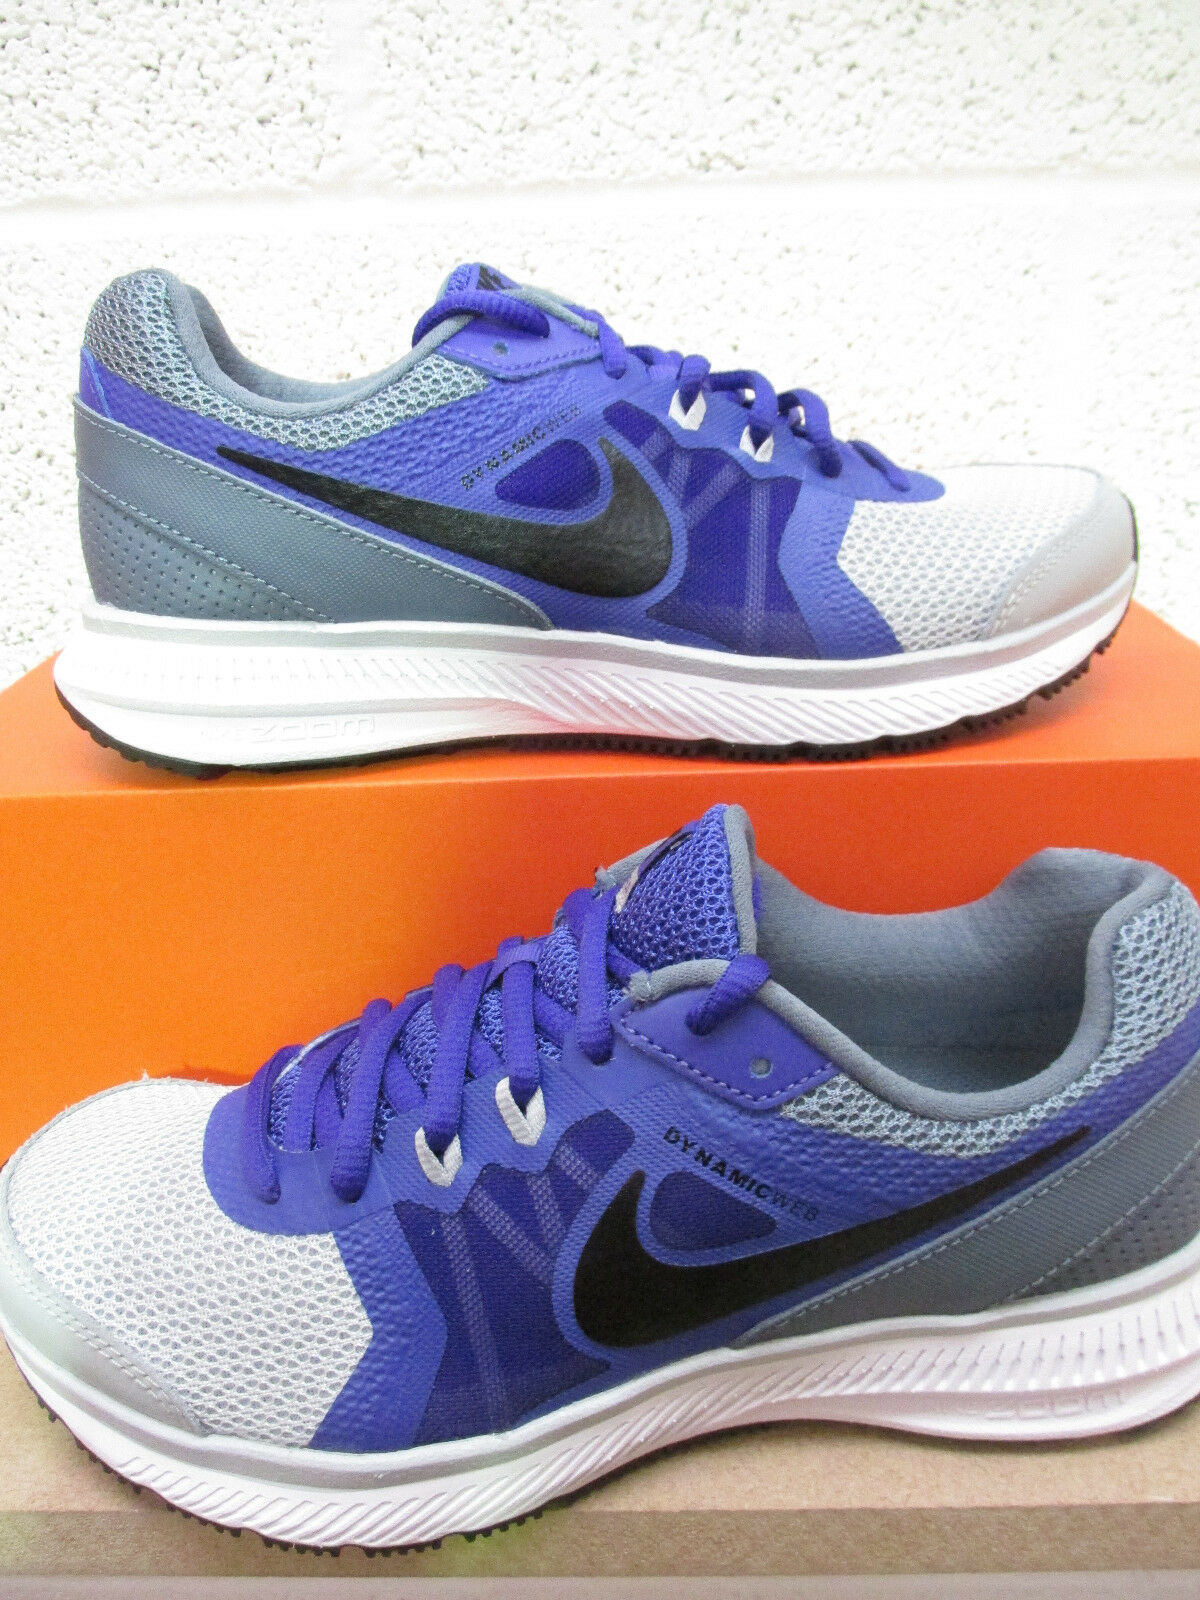 Nike Donna Zoom 684490 Winflo Scarpe da Corsa 684490 Zoom 013 Scarpe da Tennis 9bd71a